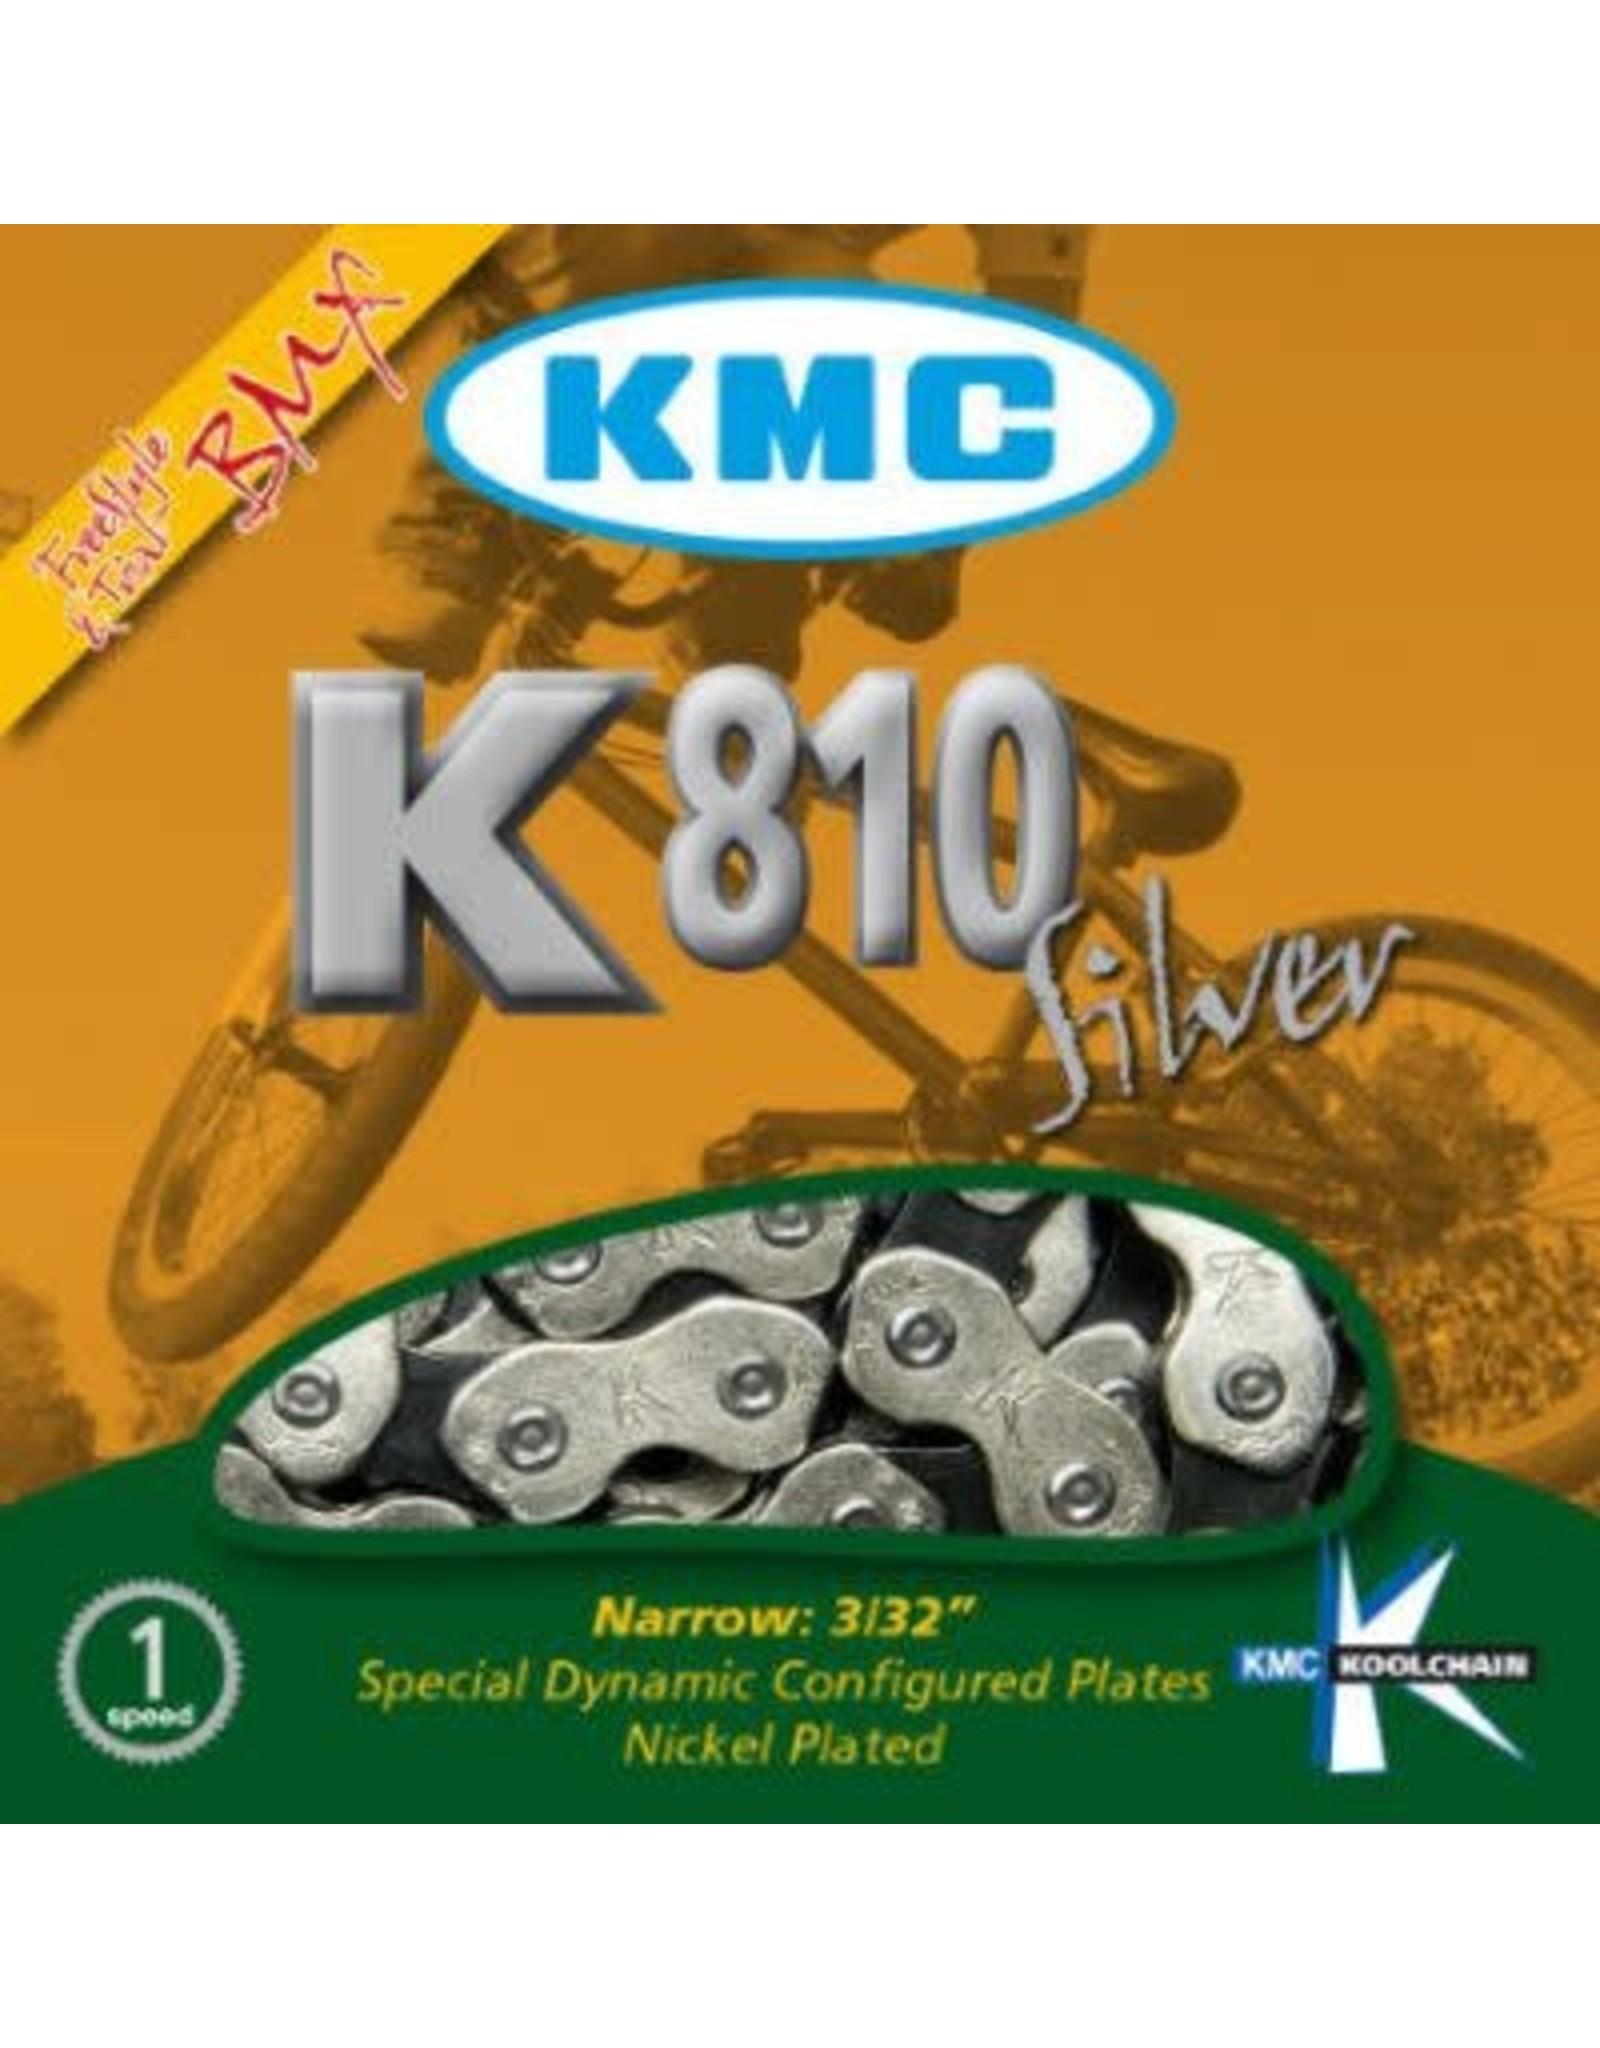 KMC Chaîne 1/2 x 3/32 - 112 maillons 1VIT K810